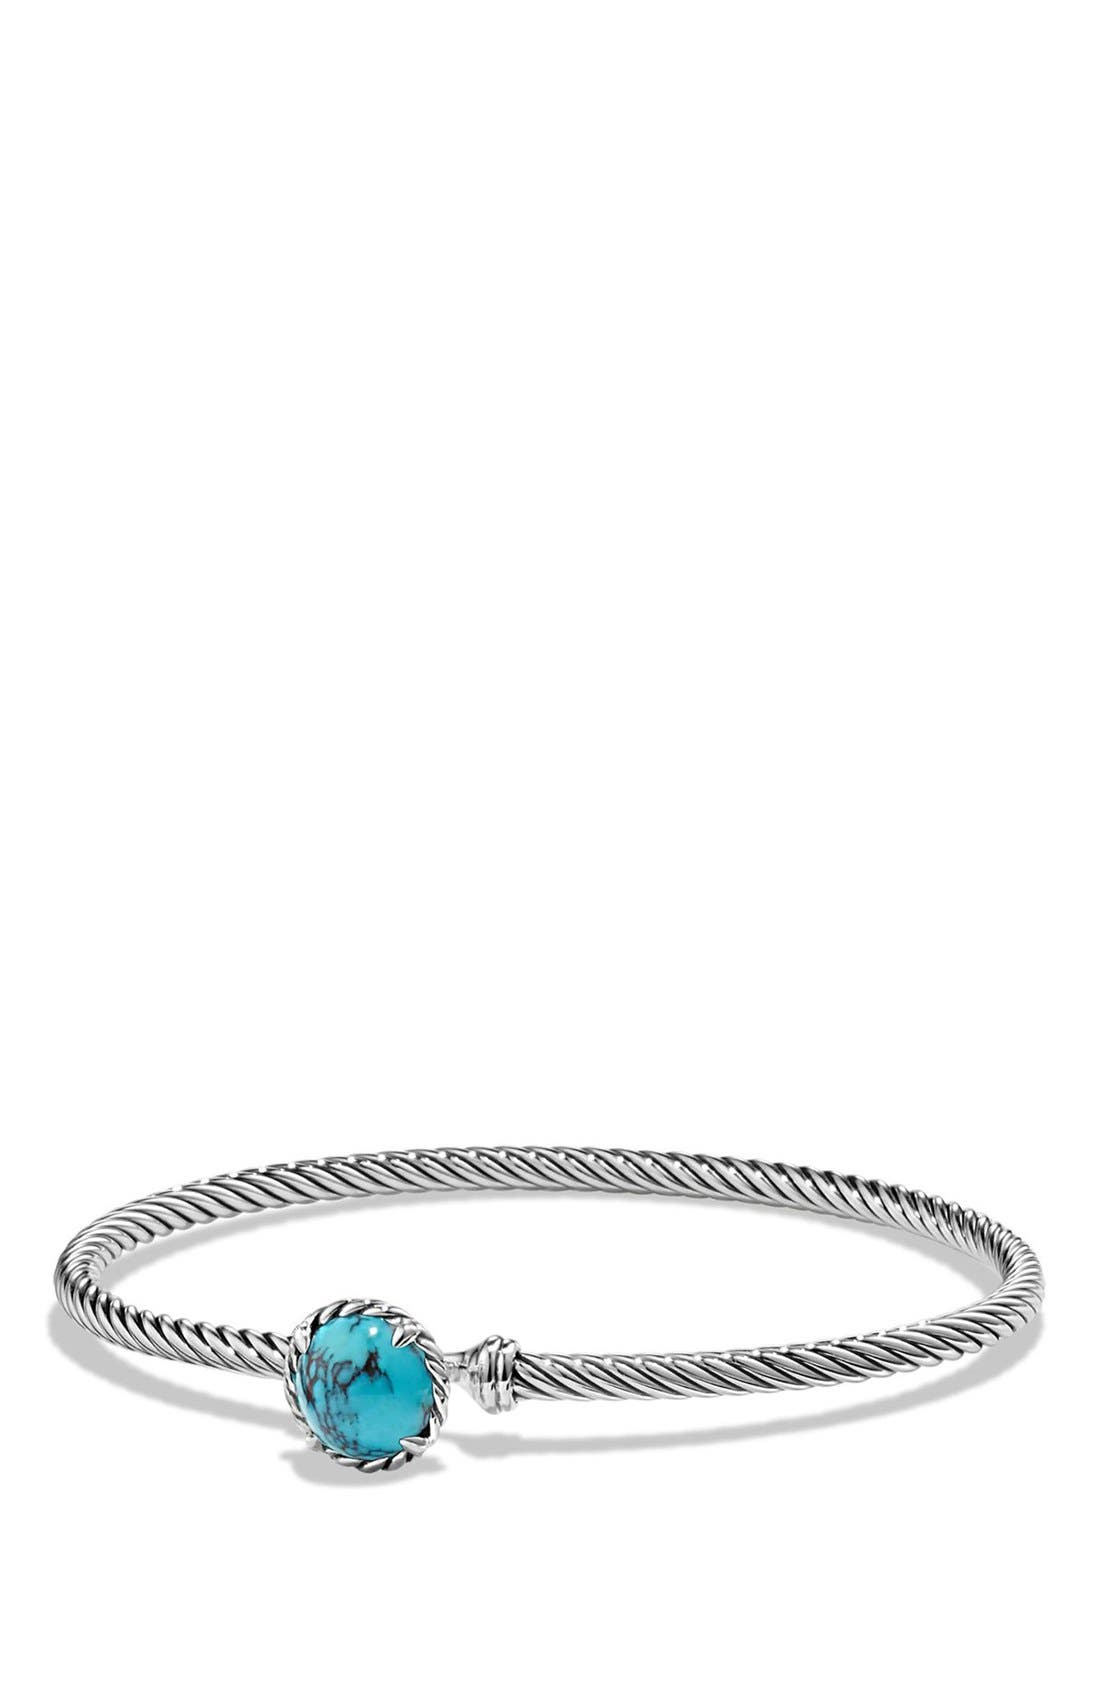 DAVID YURMAN 'Châtelaine' Bracelet